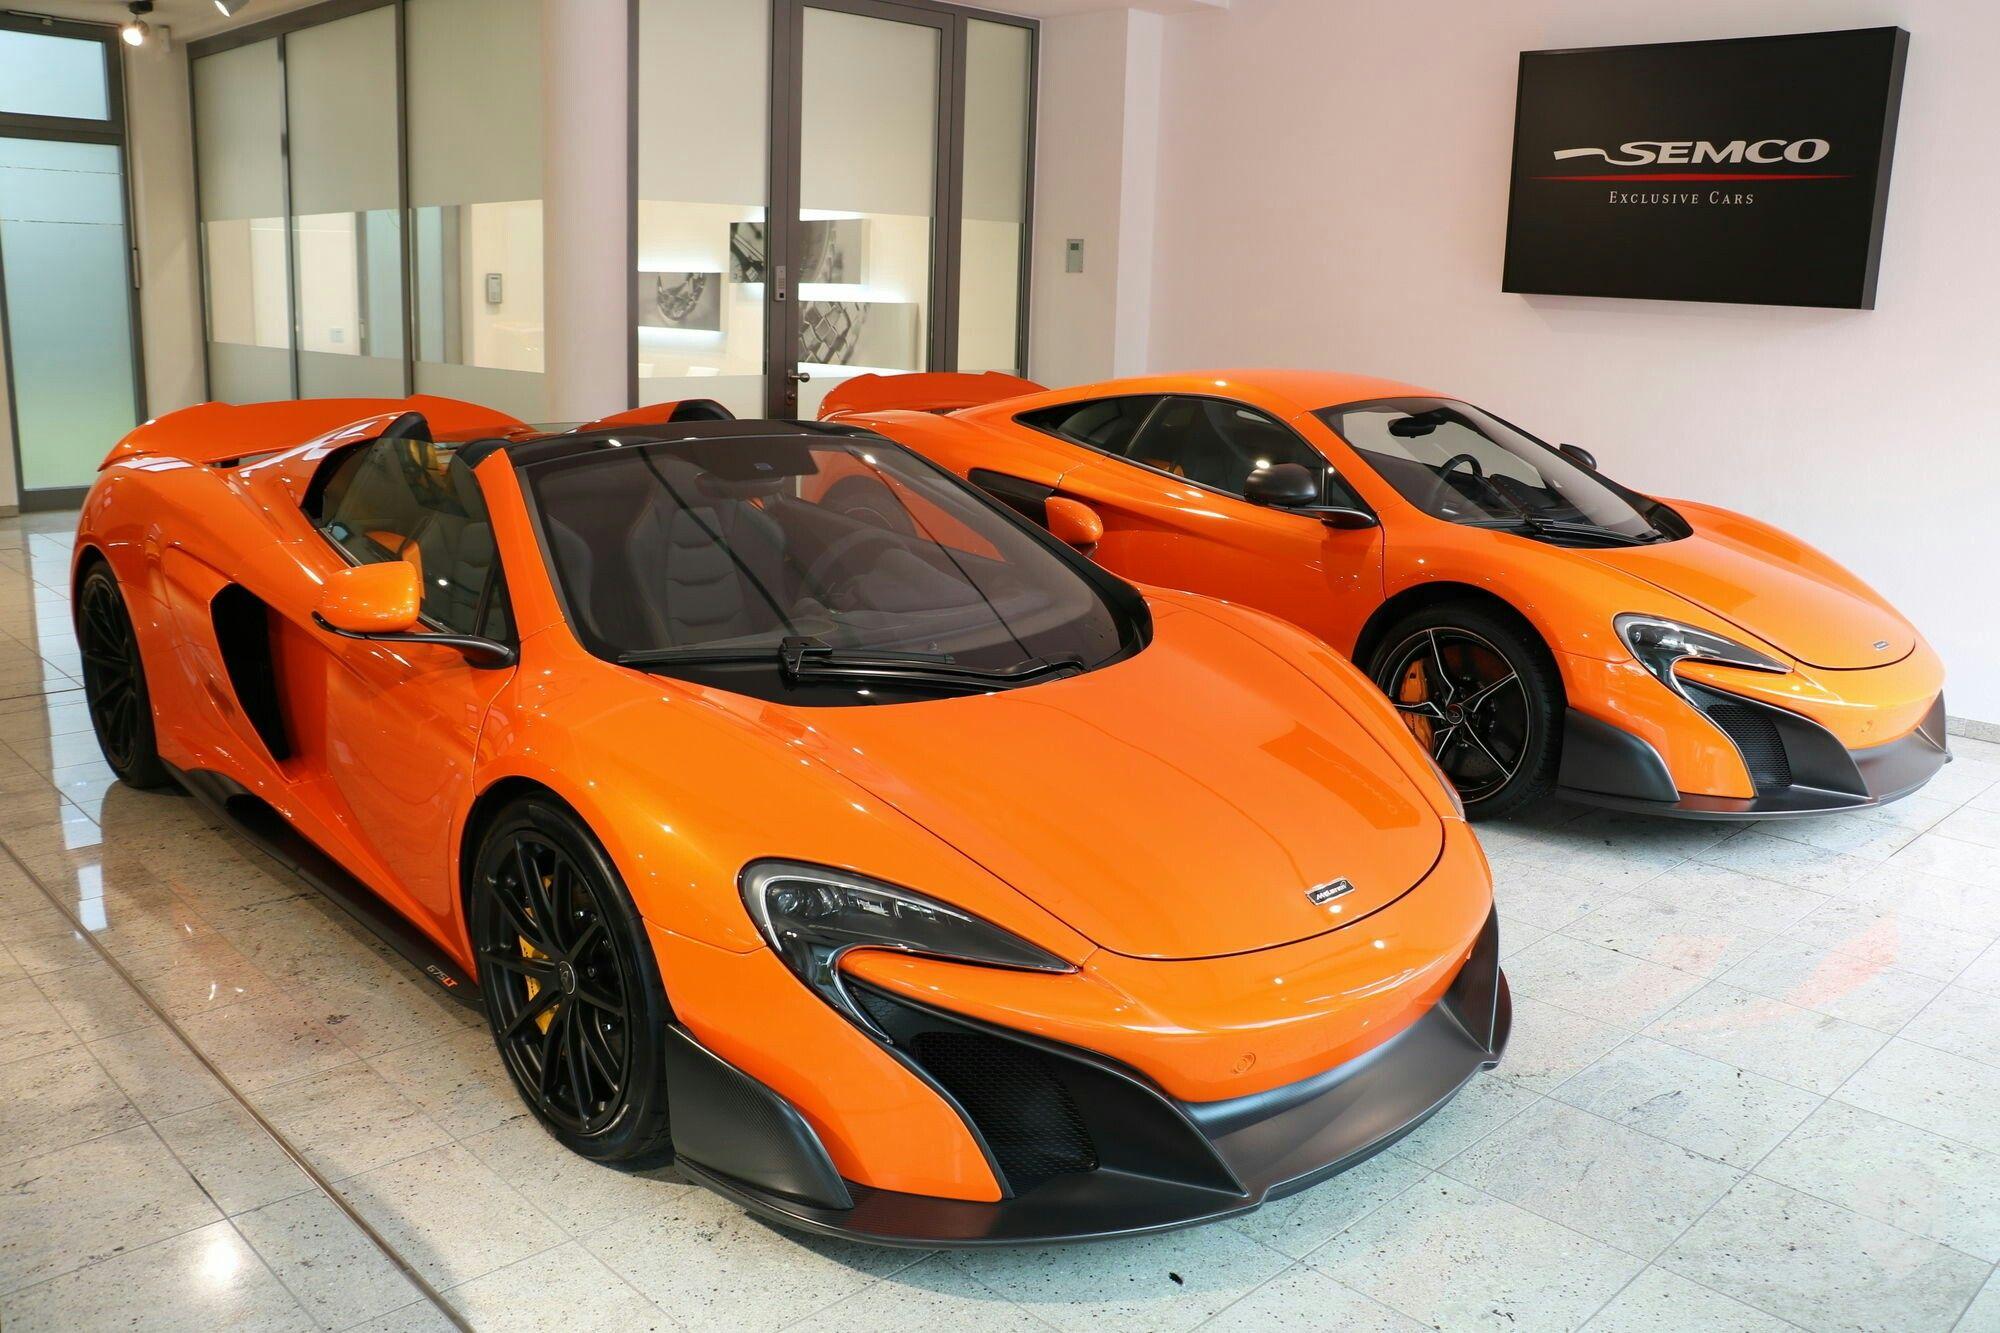 Awesome McLaren 675LT and 675 LT Spyder